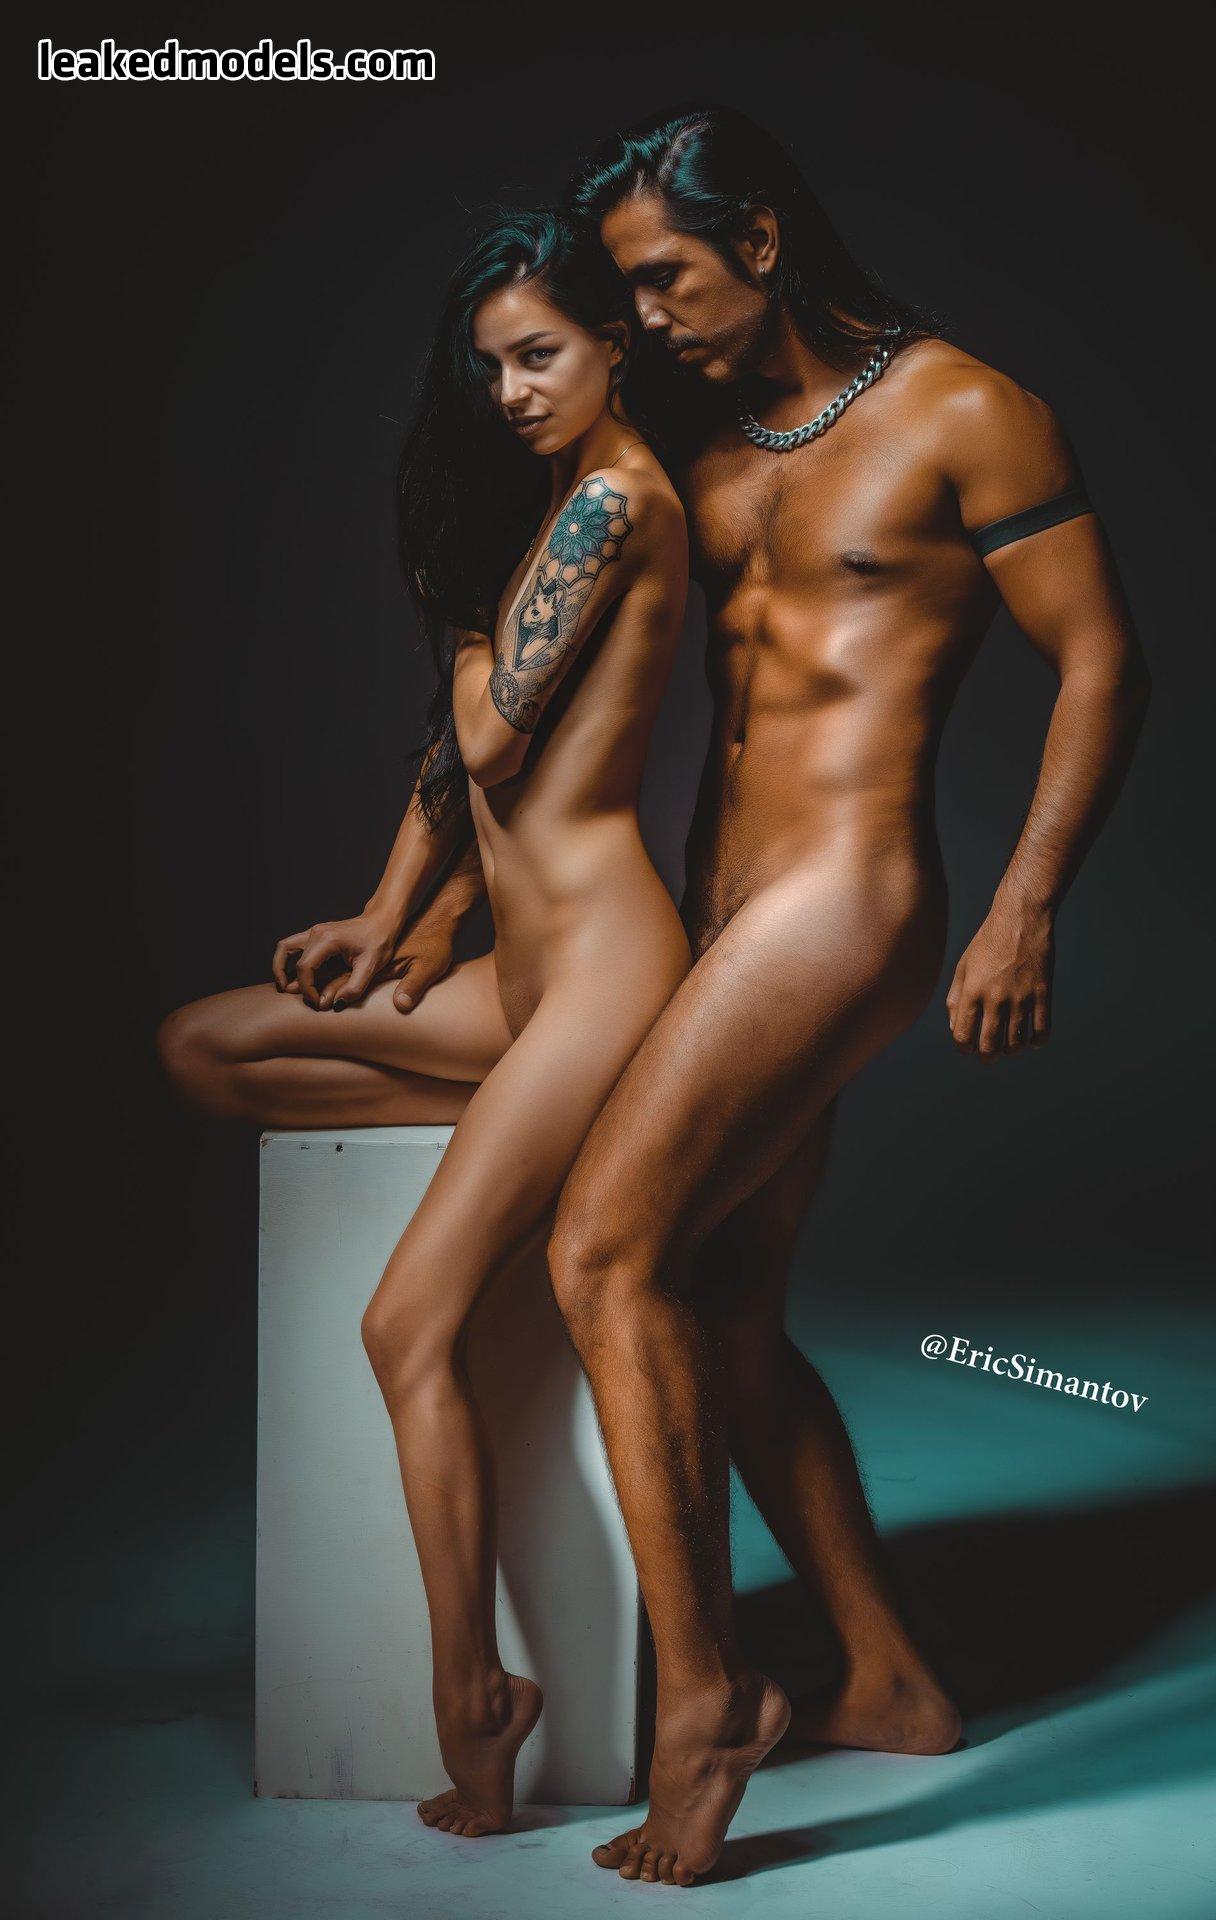 casey goldman leaked nude leakedmodels.com 0003 - Casey Goldman Instagram Nude Leaks (19 Photos)